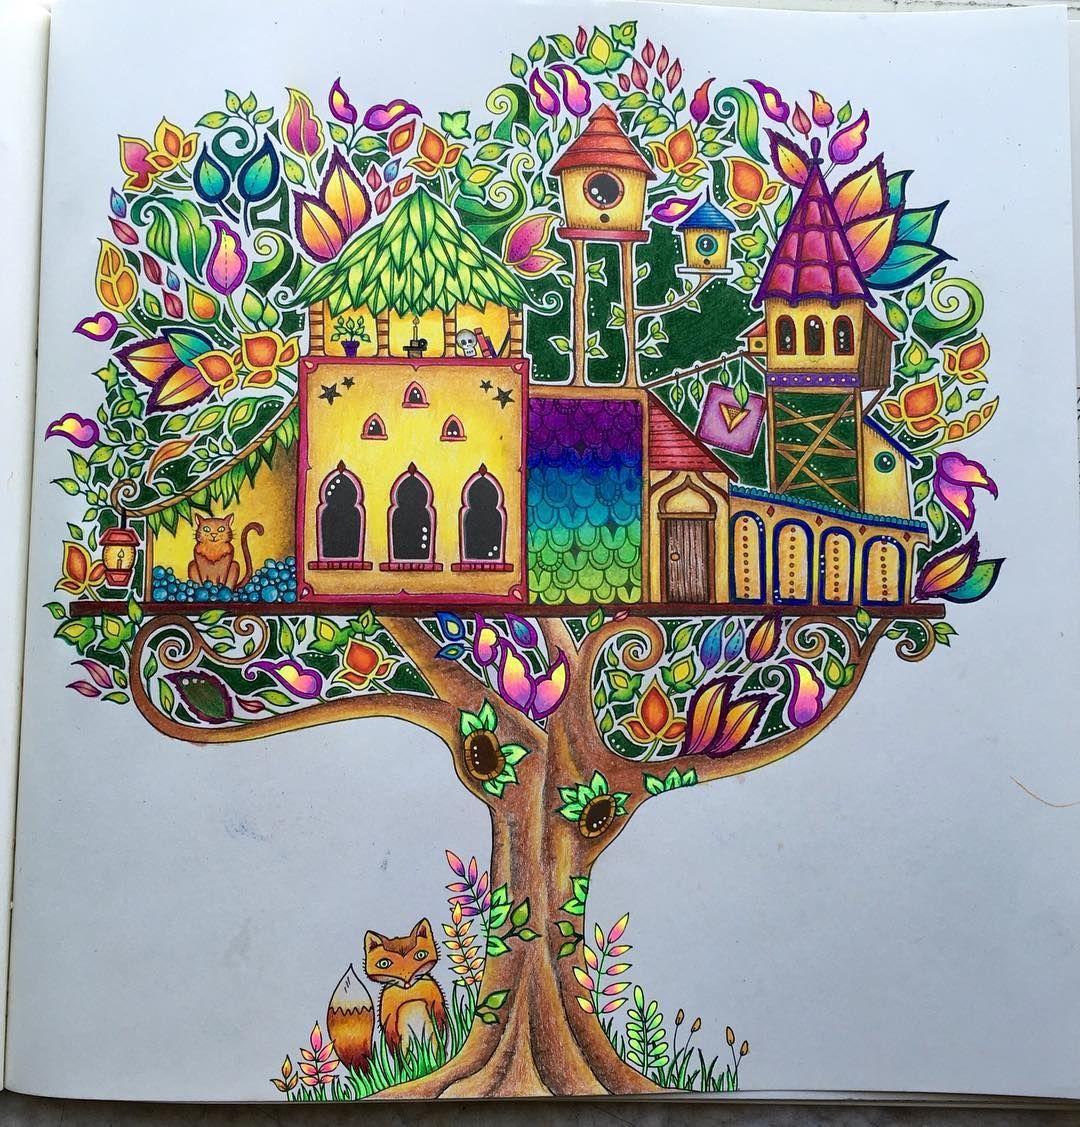 Instagram Photo By Katia Apr 6 2016 At 3 45pm Utc Enchanted Forest Coloring Book Forest Coloring Book Enchanted Forest Coloring